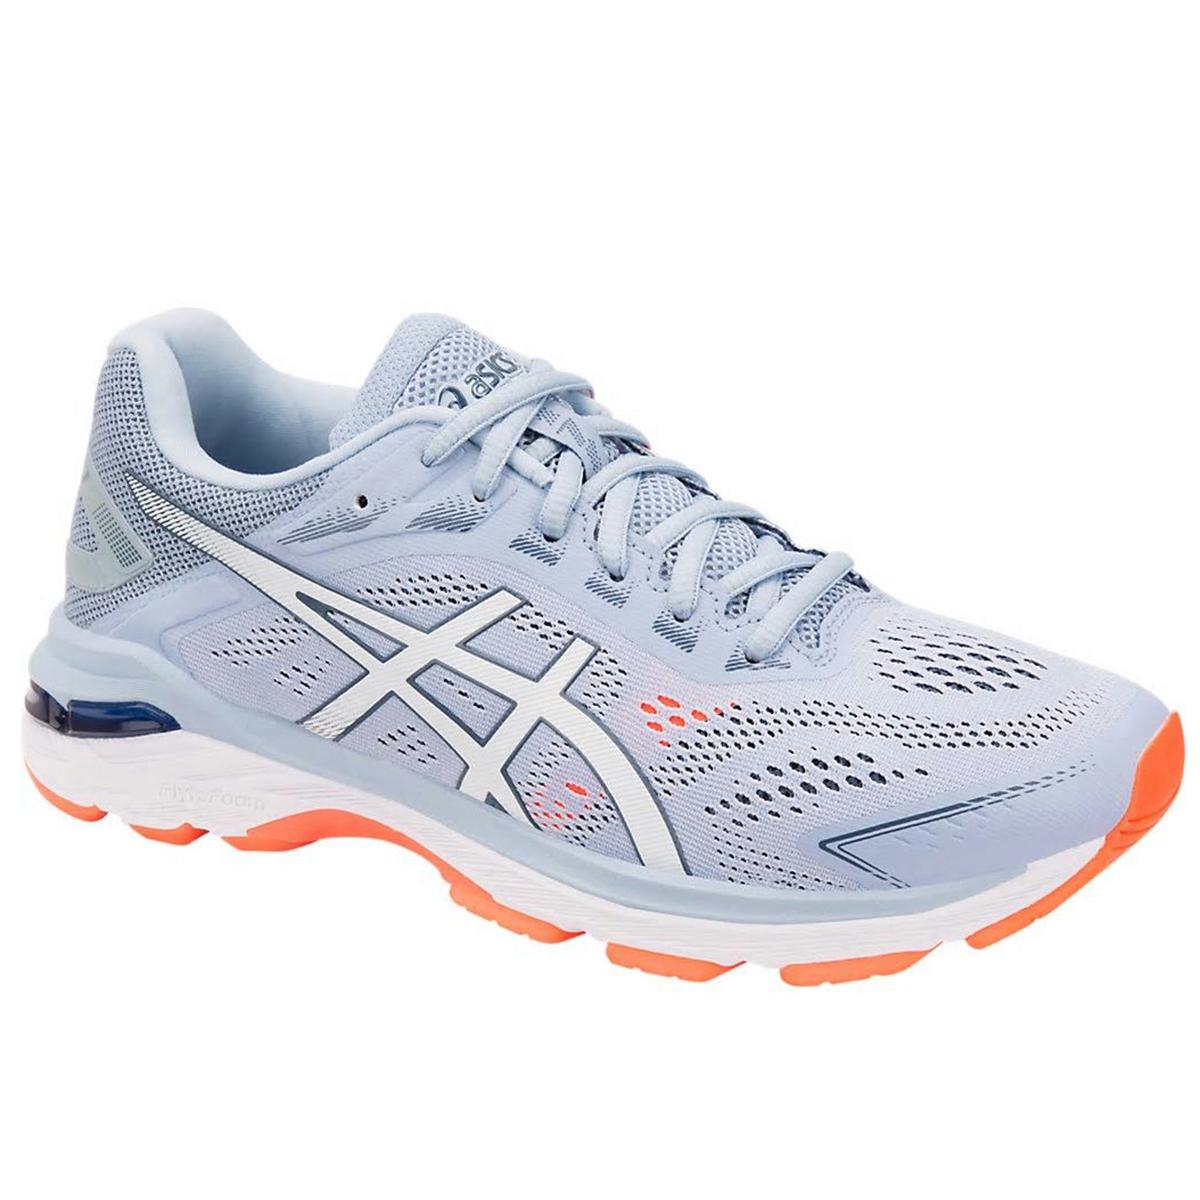 Schuhe, Outdoor Sport Online Shop Sport Rankl